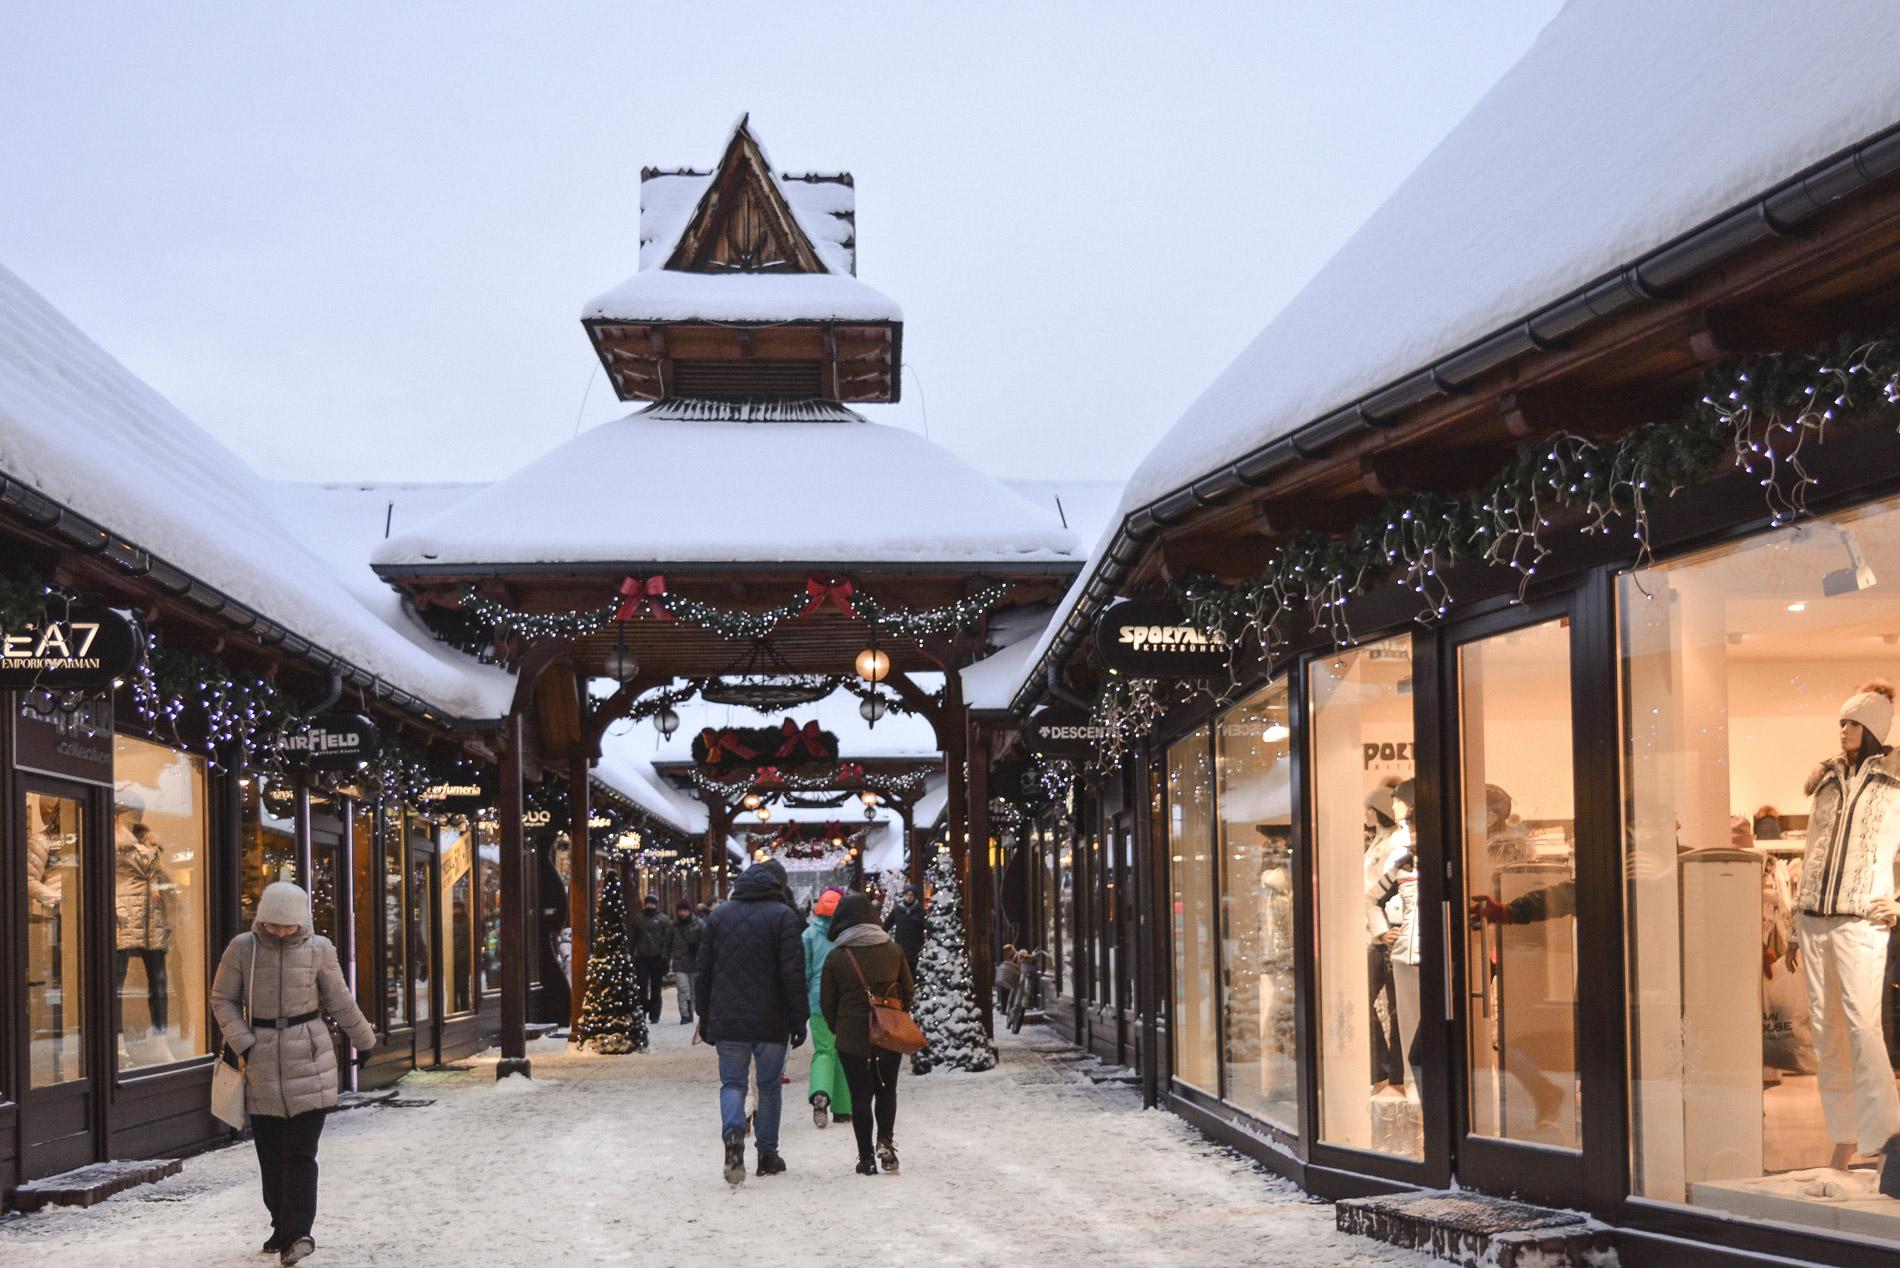 O shopping de Zakopane ao livre e cobre-se de neve no Inverno